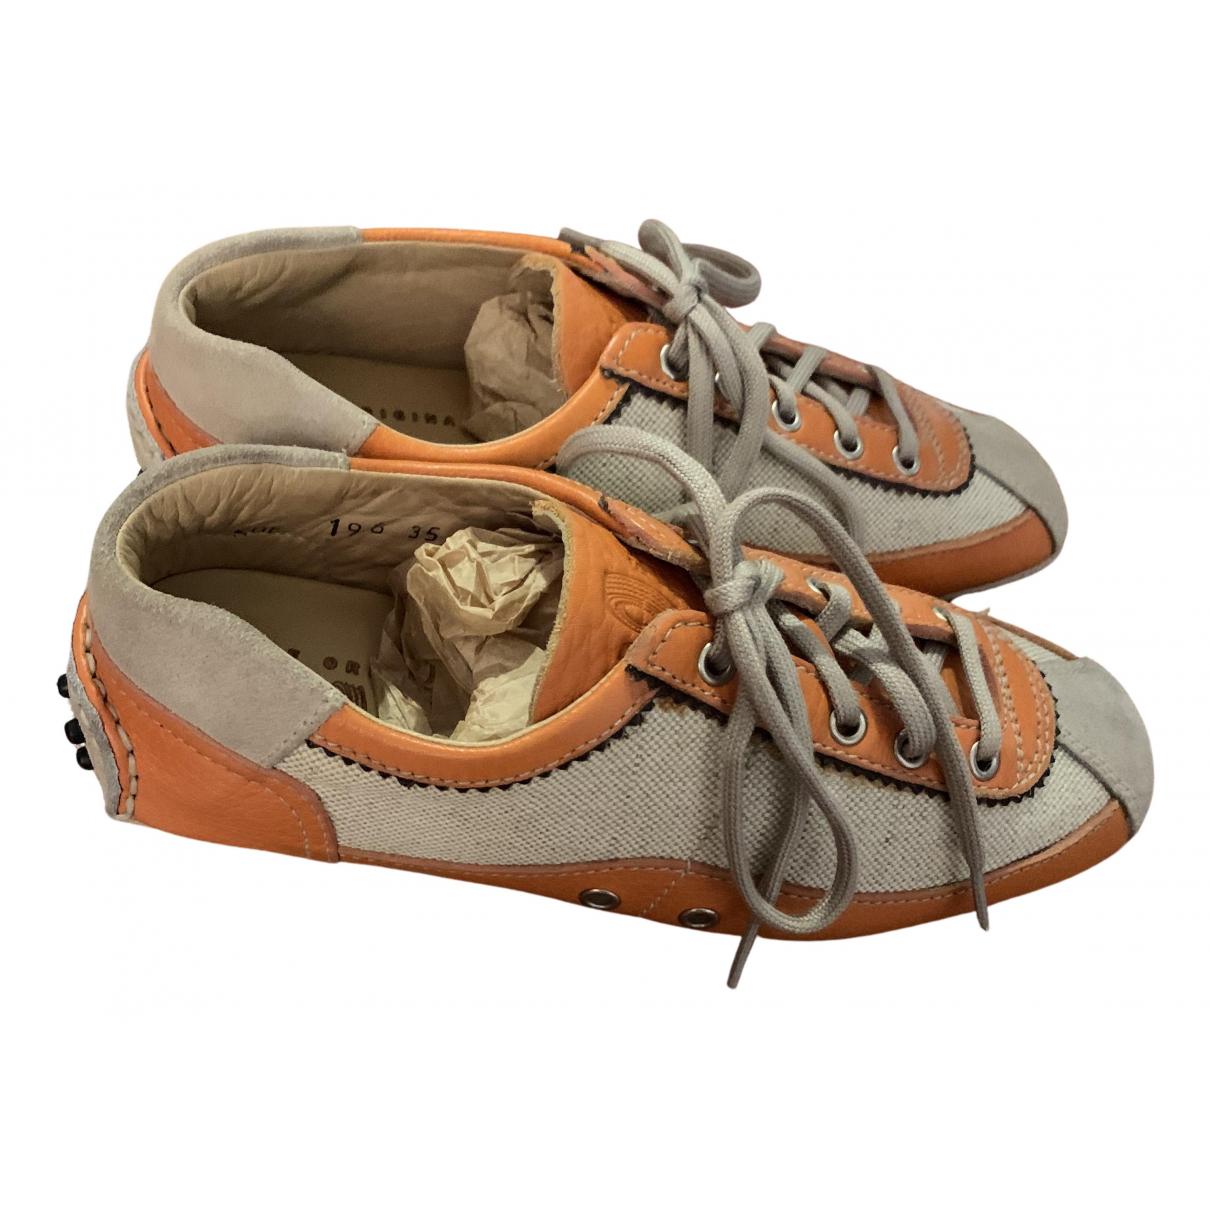 Carshoe N Orange Leather Trainers for Women 35 EU